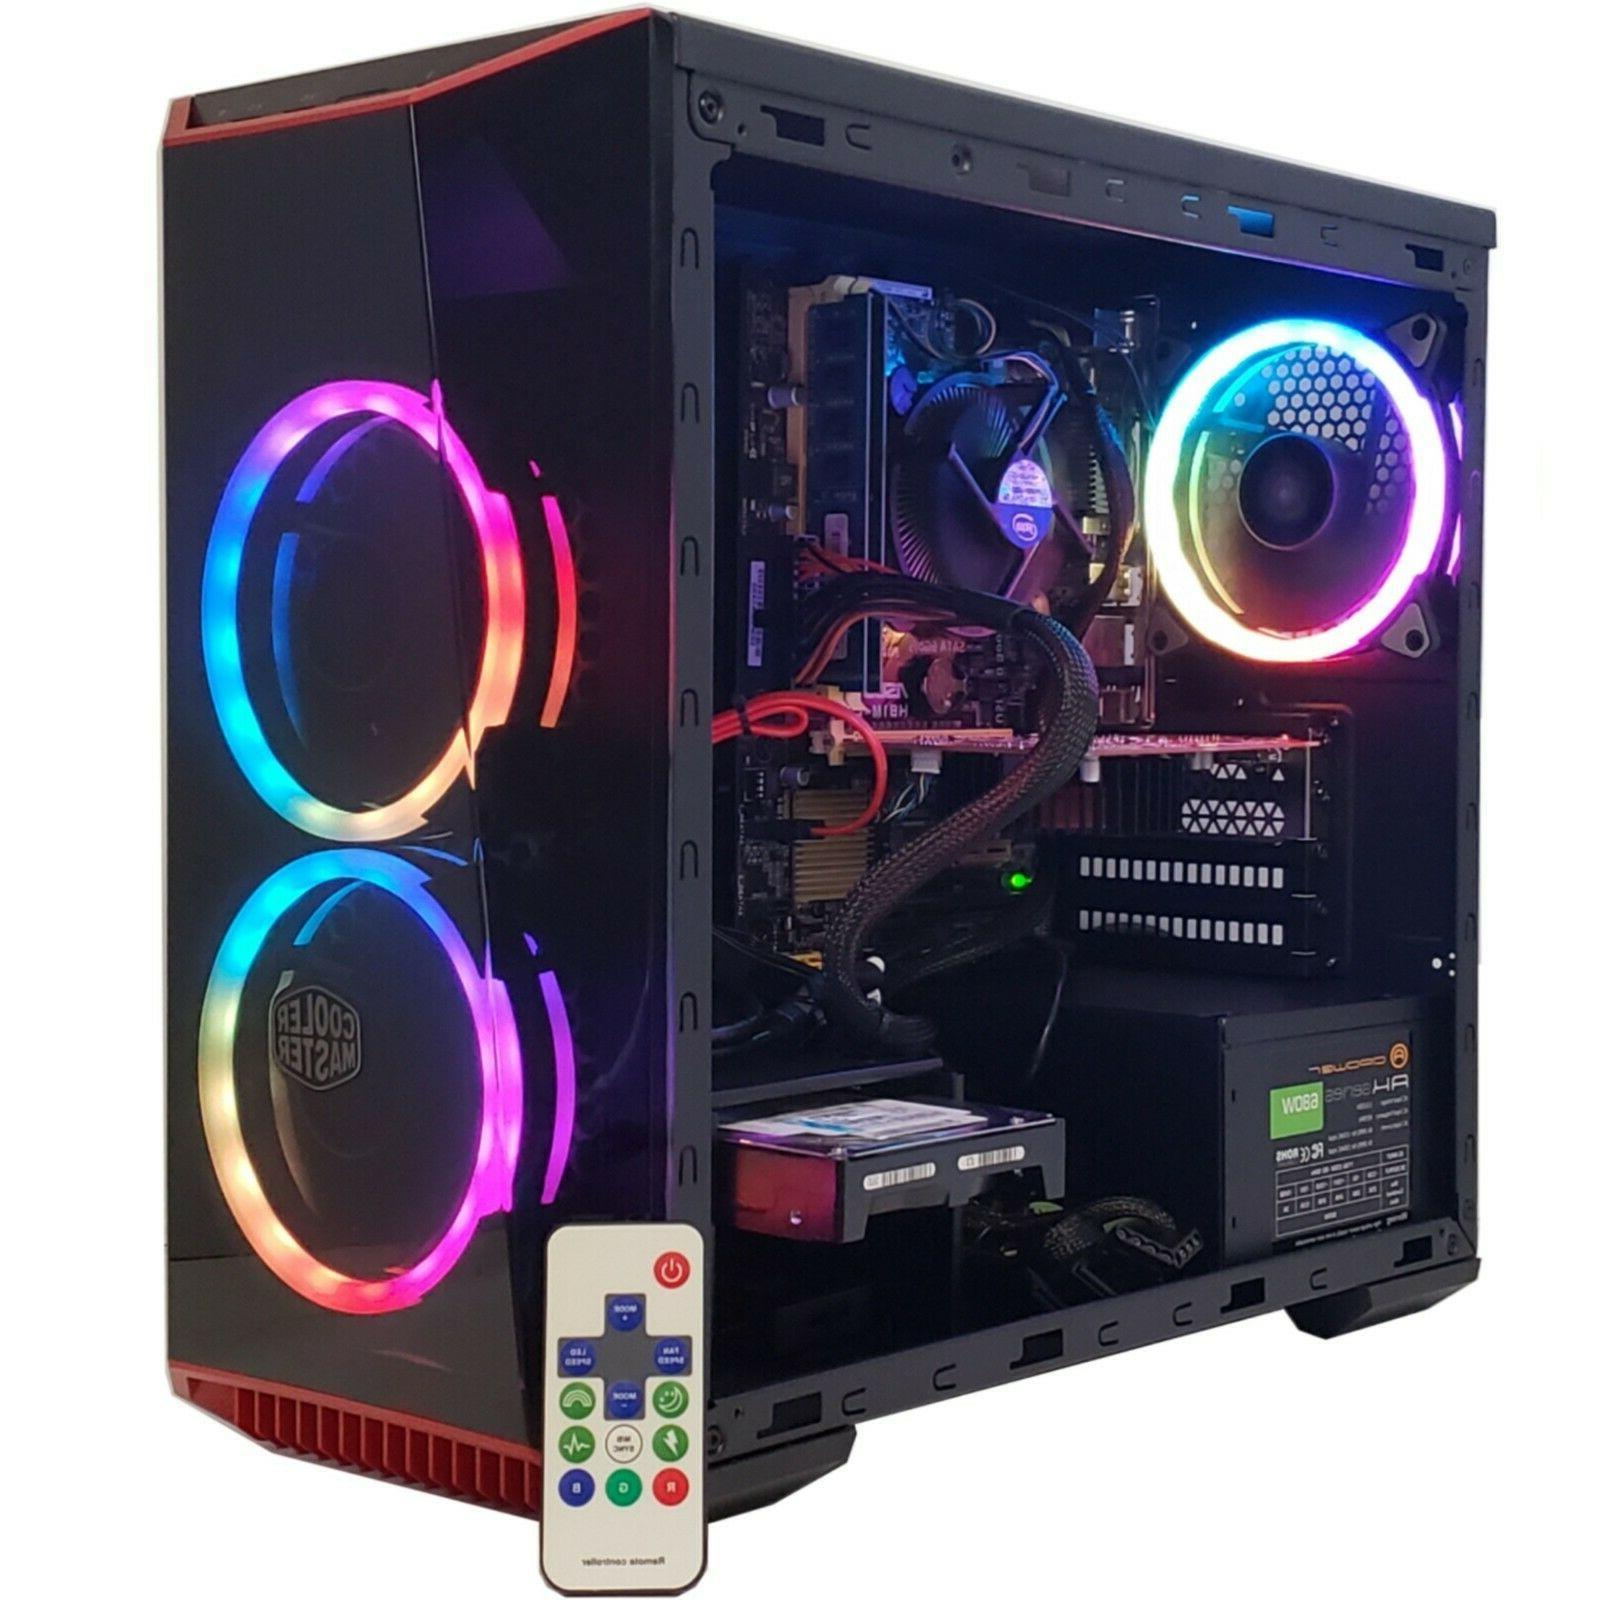 GAMING PC RGB DESKTOP COMPUTER RYZEN 3 8GB RAM RADEON RX 460